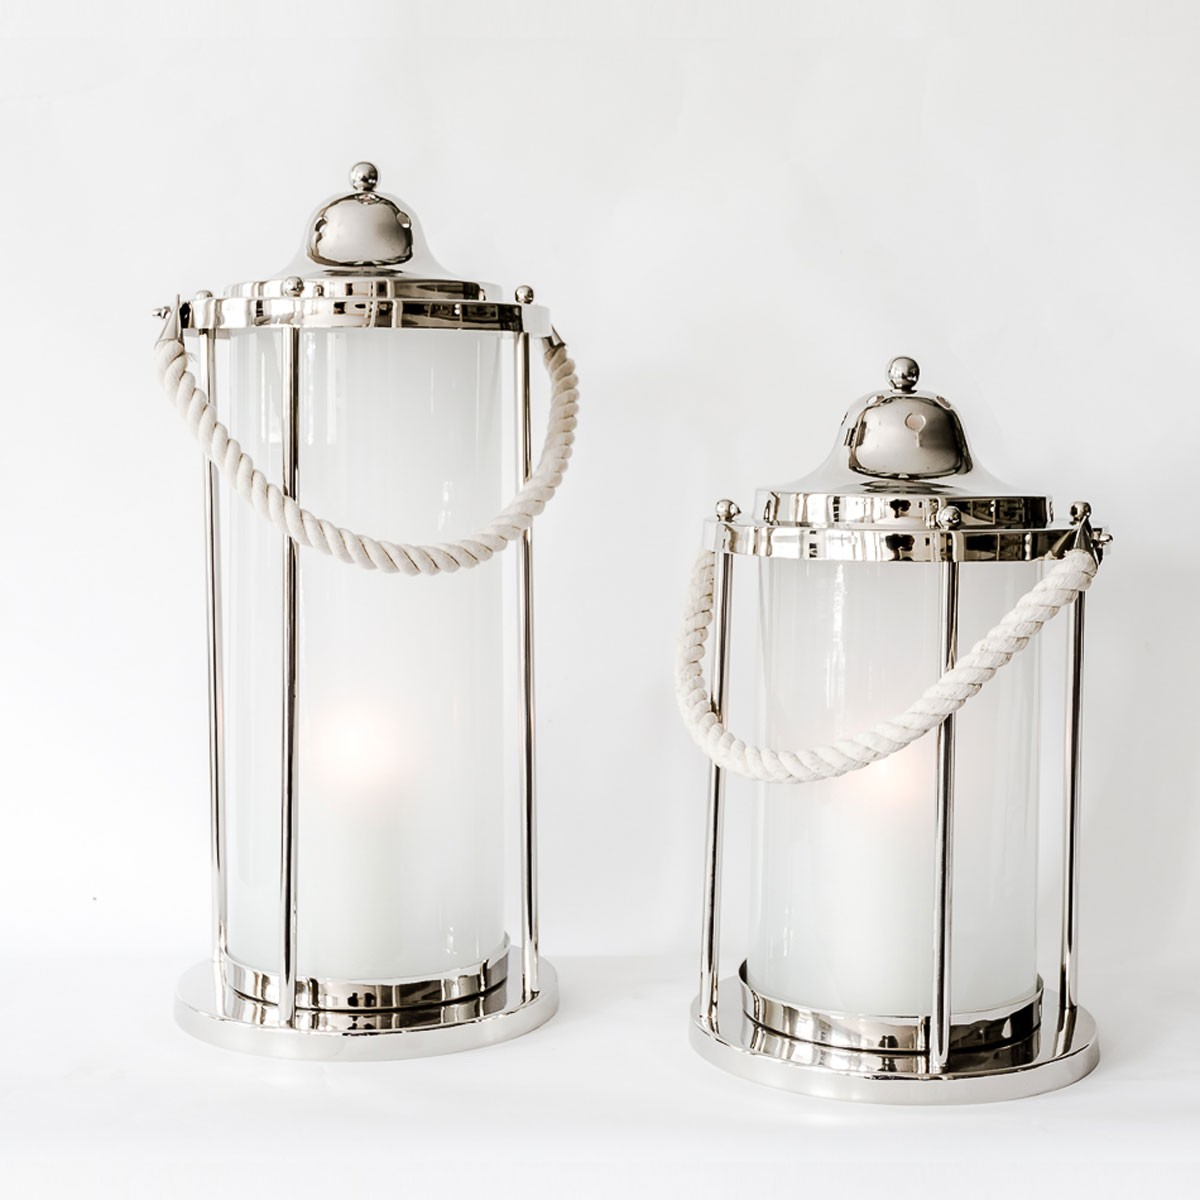 Grace Large - Aluminium and Glass Decorative Lantern